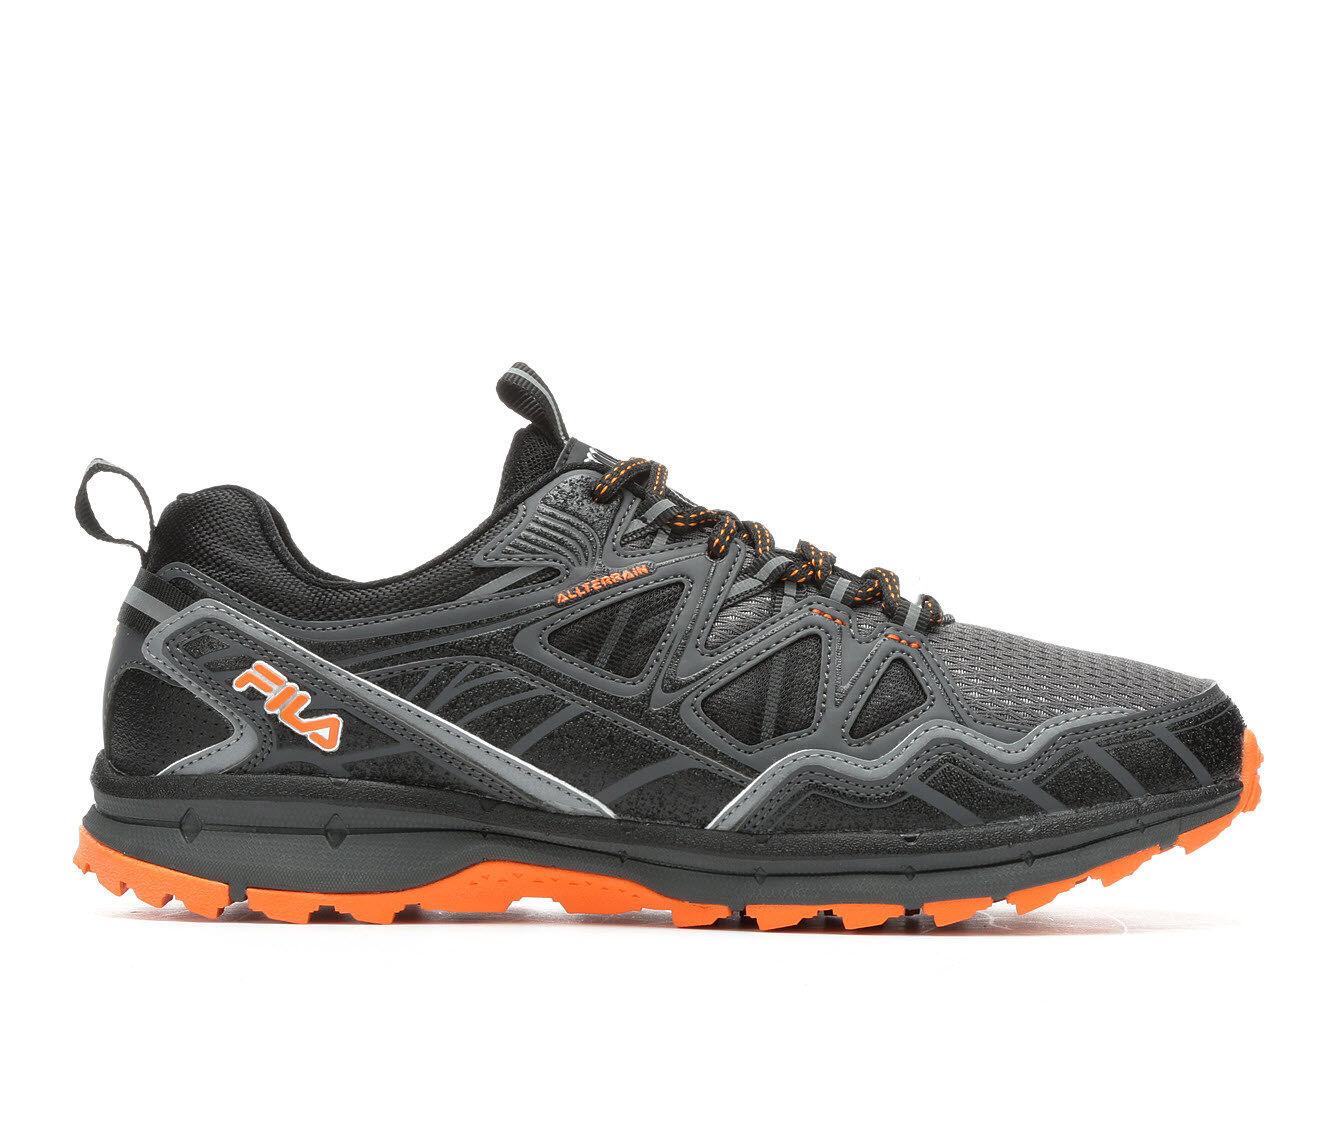 Men's Fila Memory TKO TR 5.0 Running Shoes clearance shop ZsD4pMmQhw